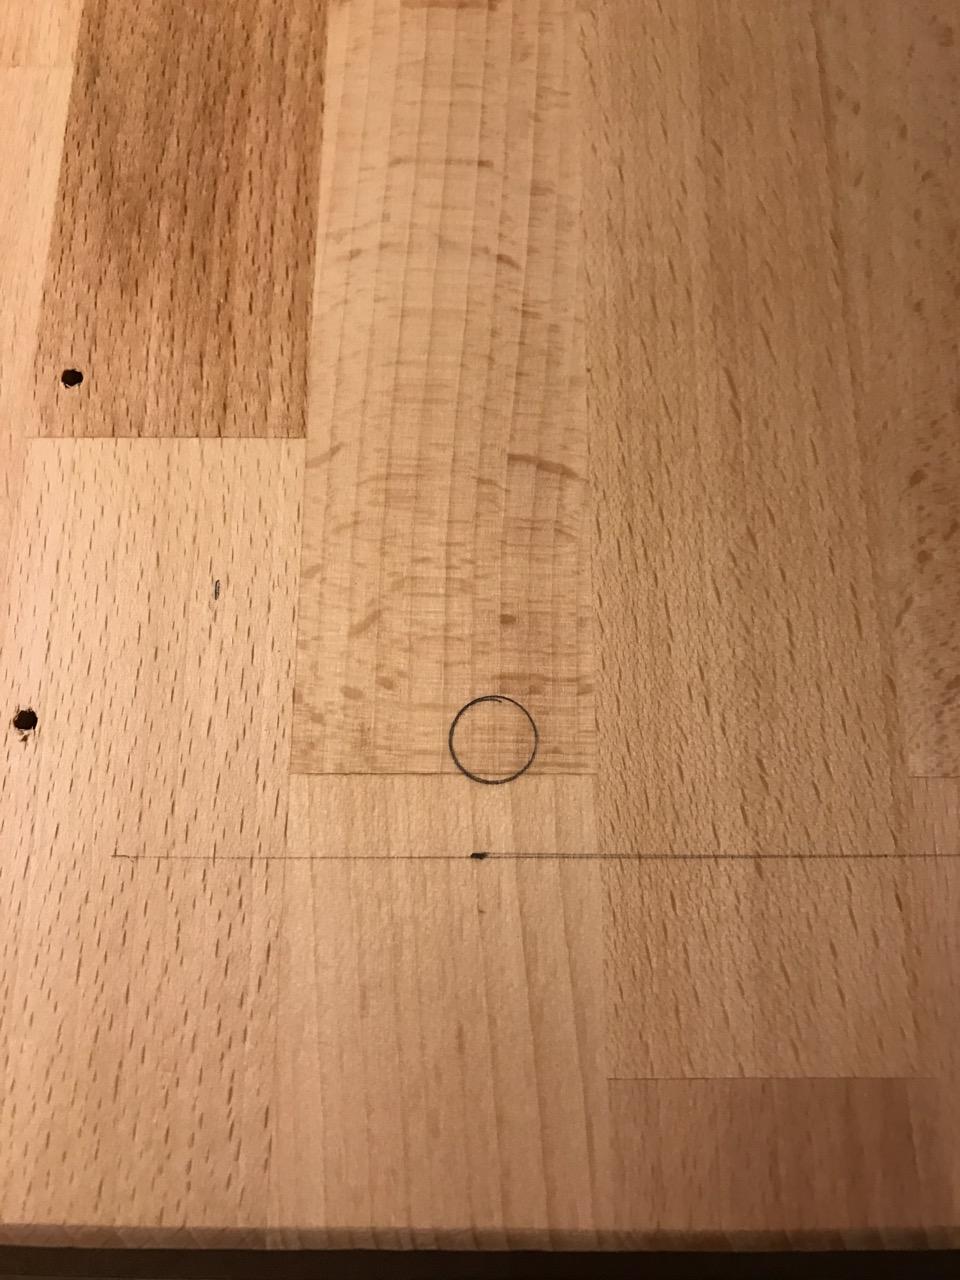 progress measurement, line, and drill hole